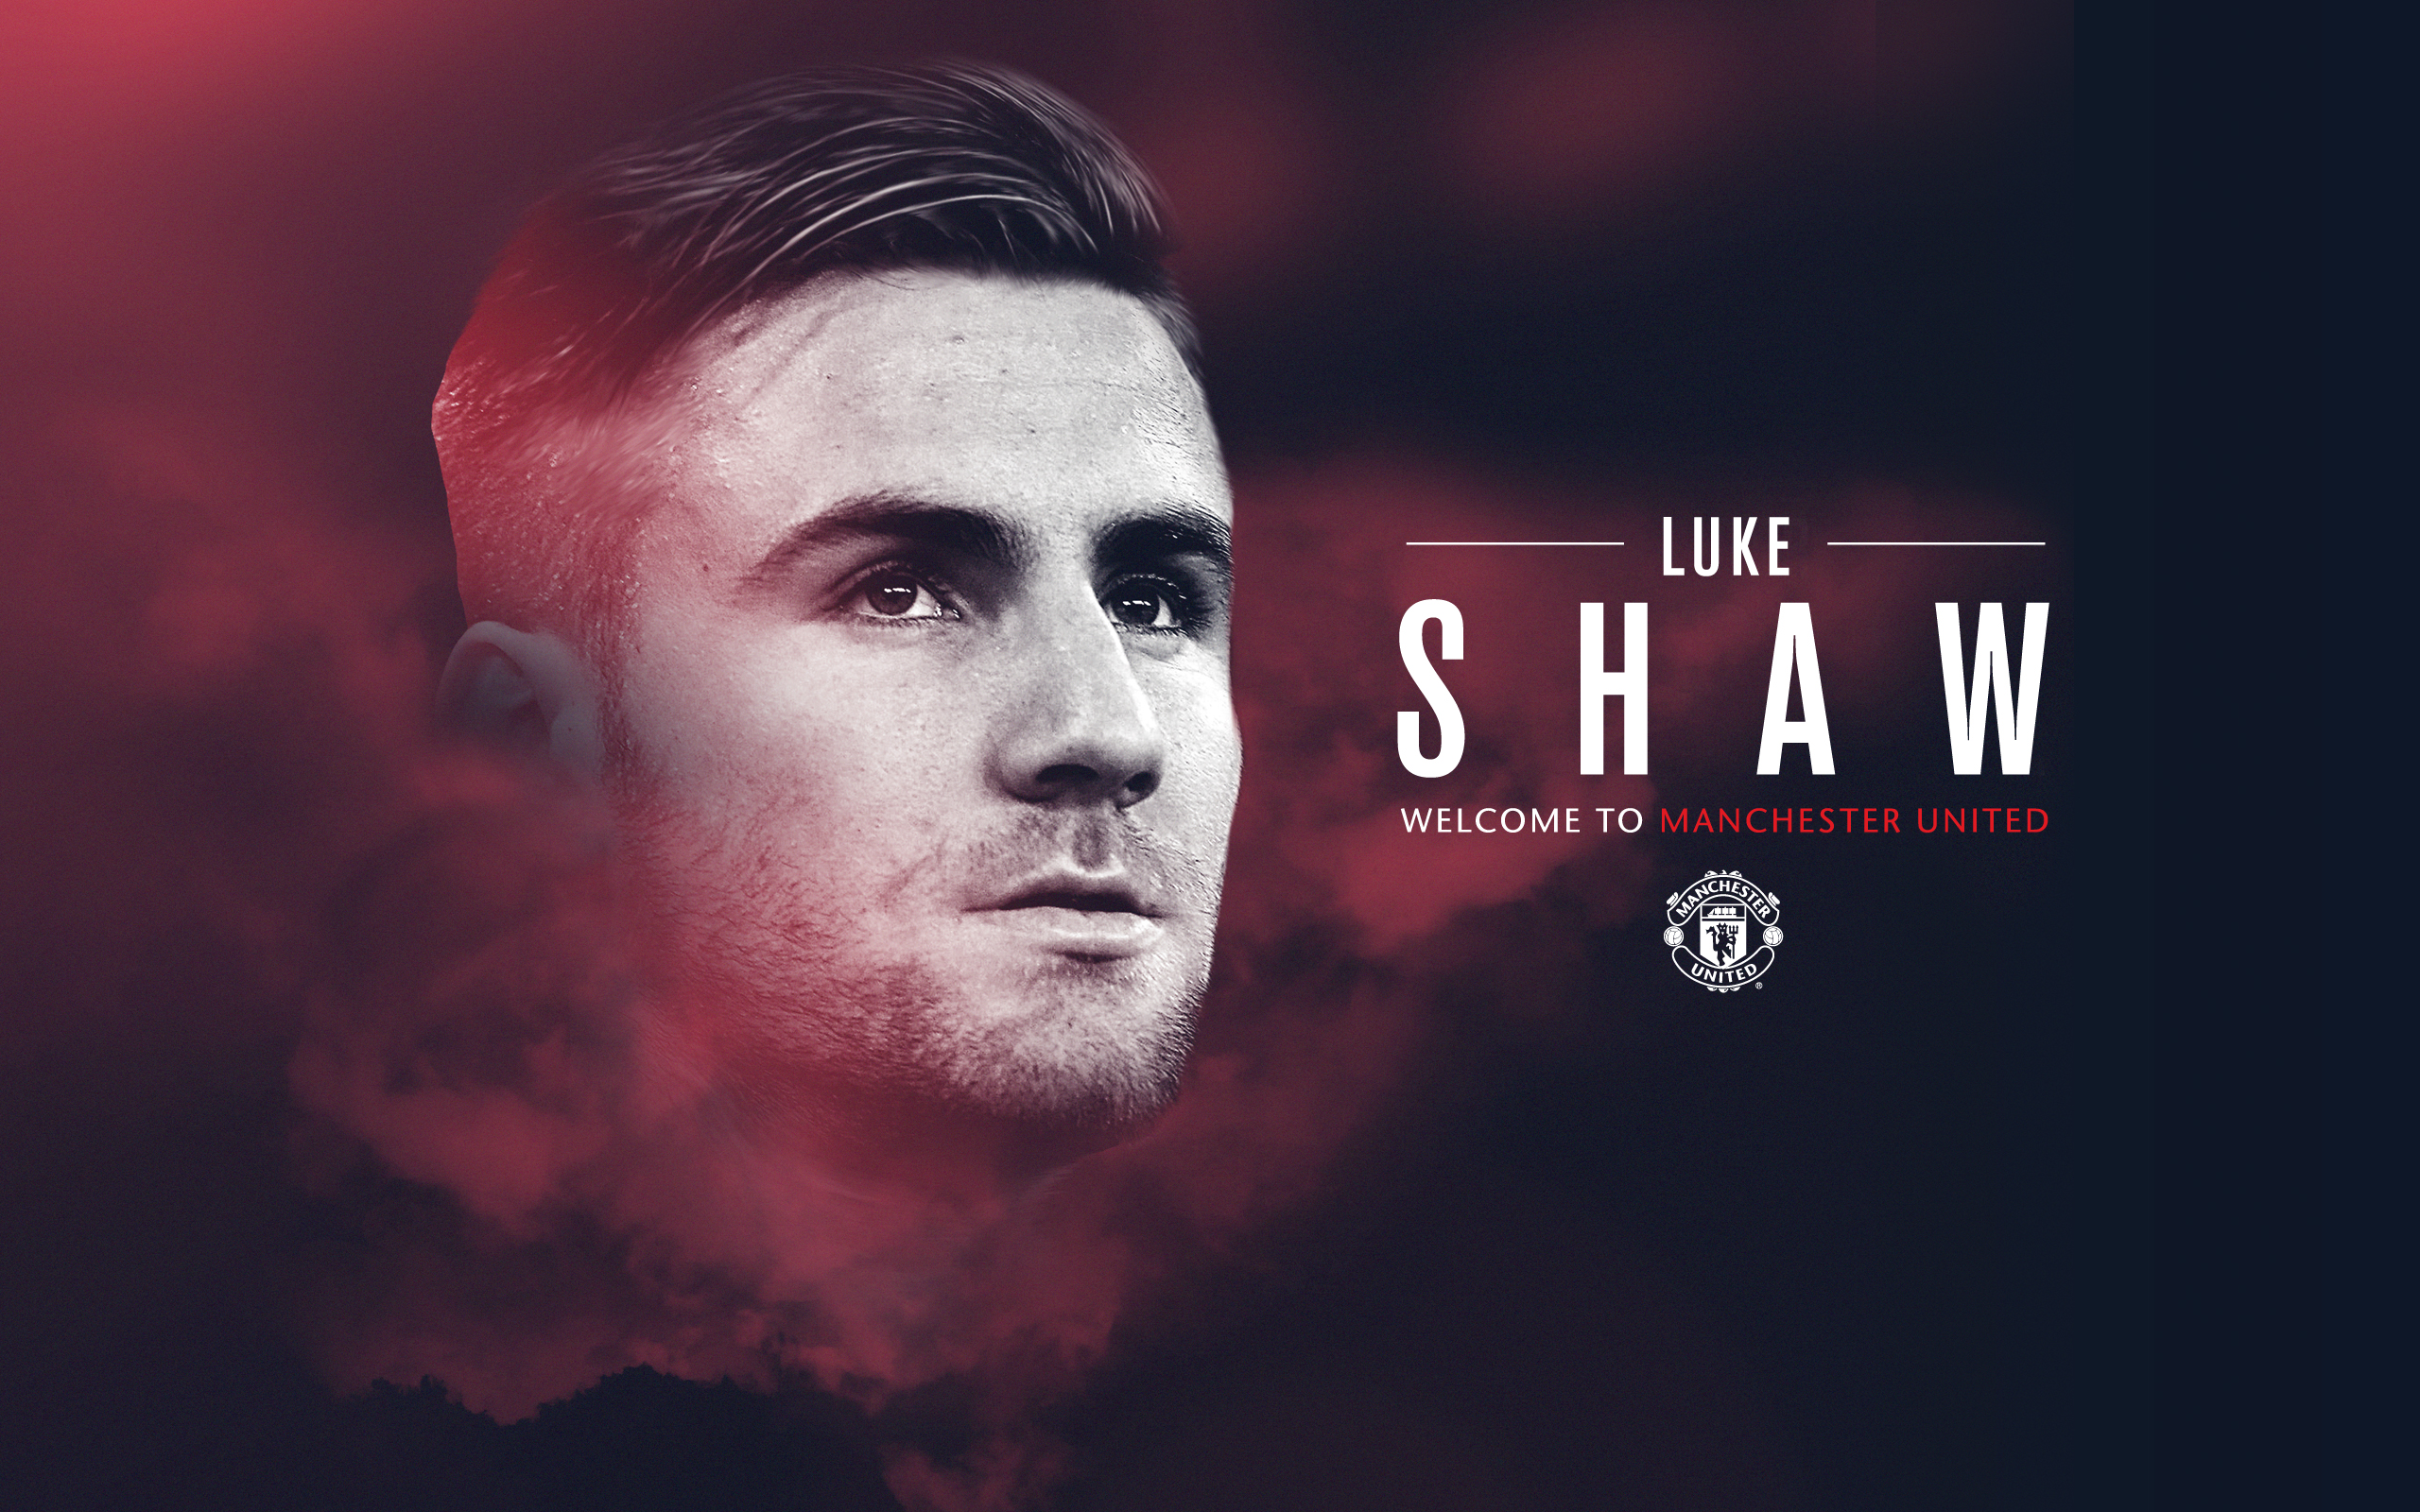 Luke Shaw Wallpaper   Red Army Fanclub 2560x1600